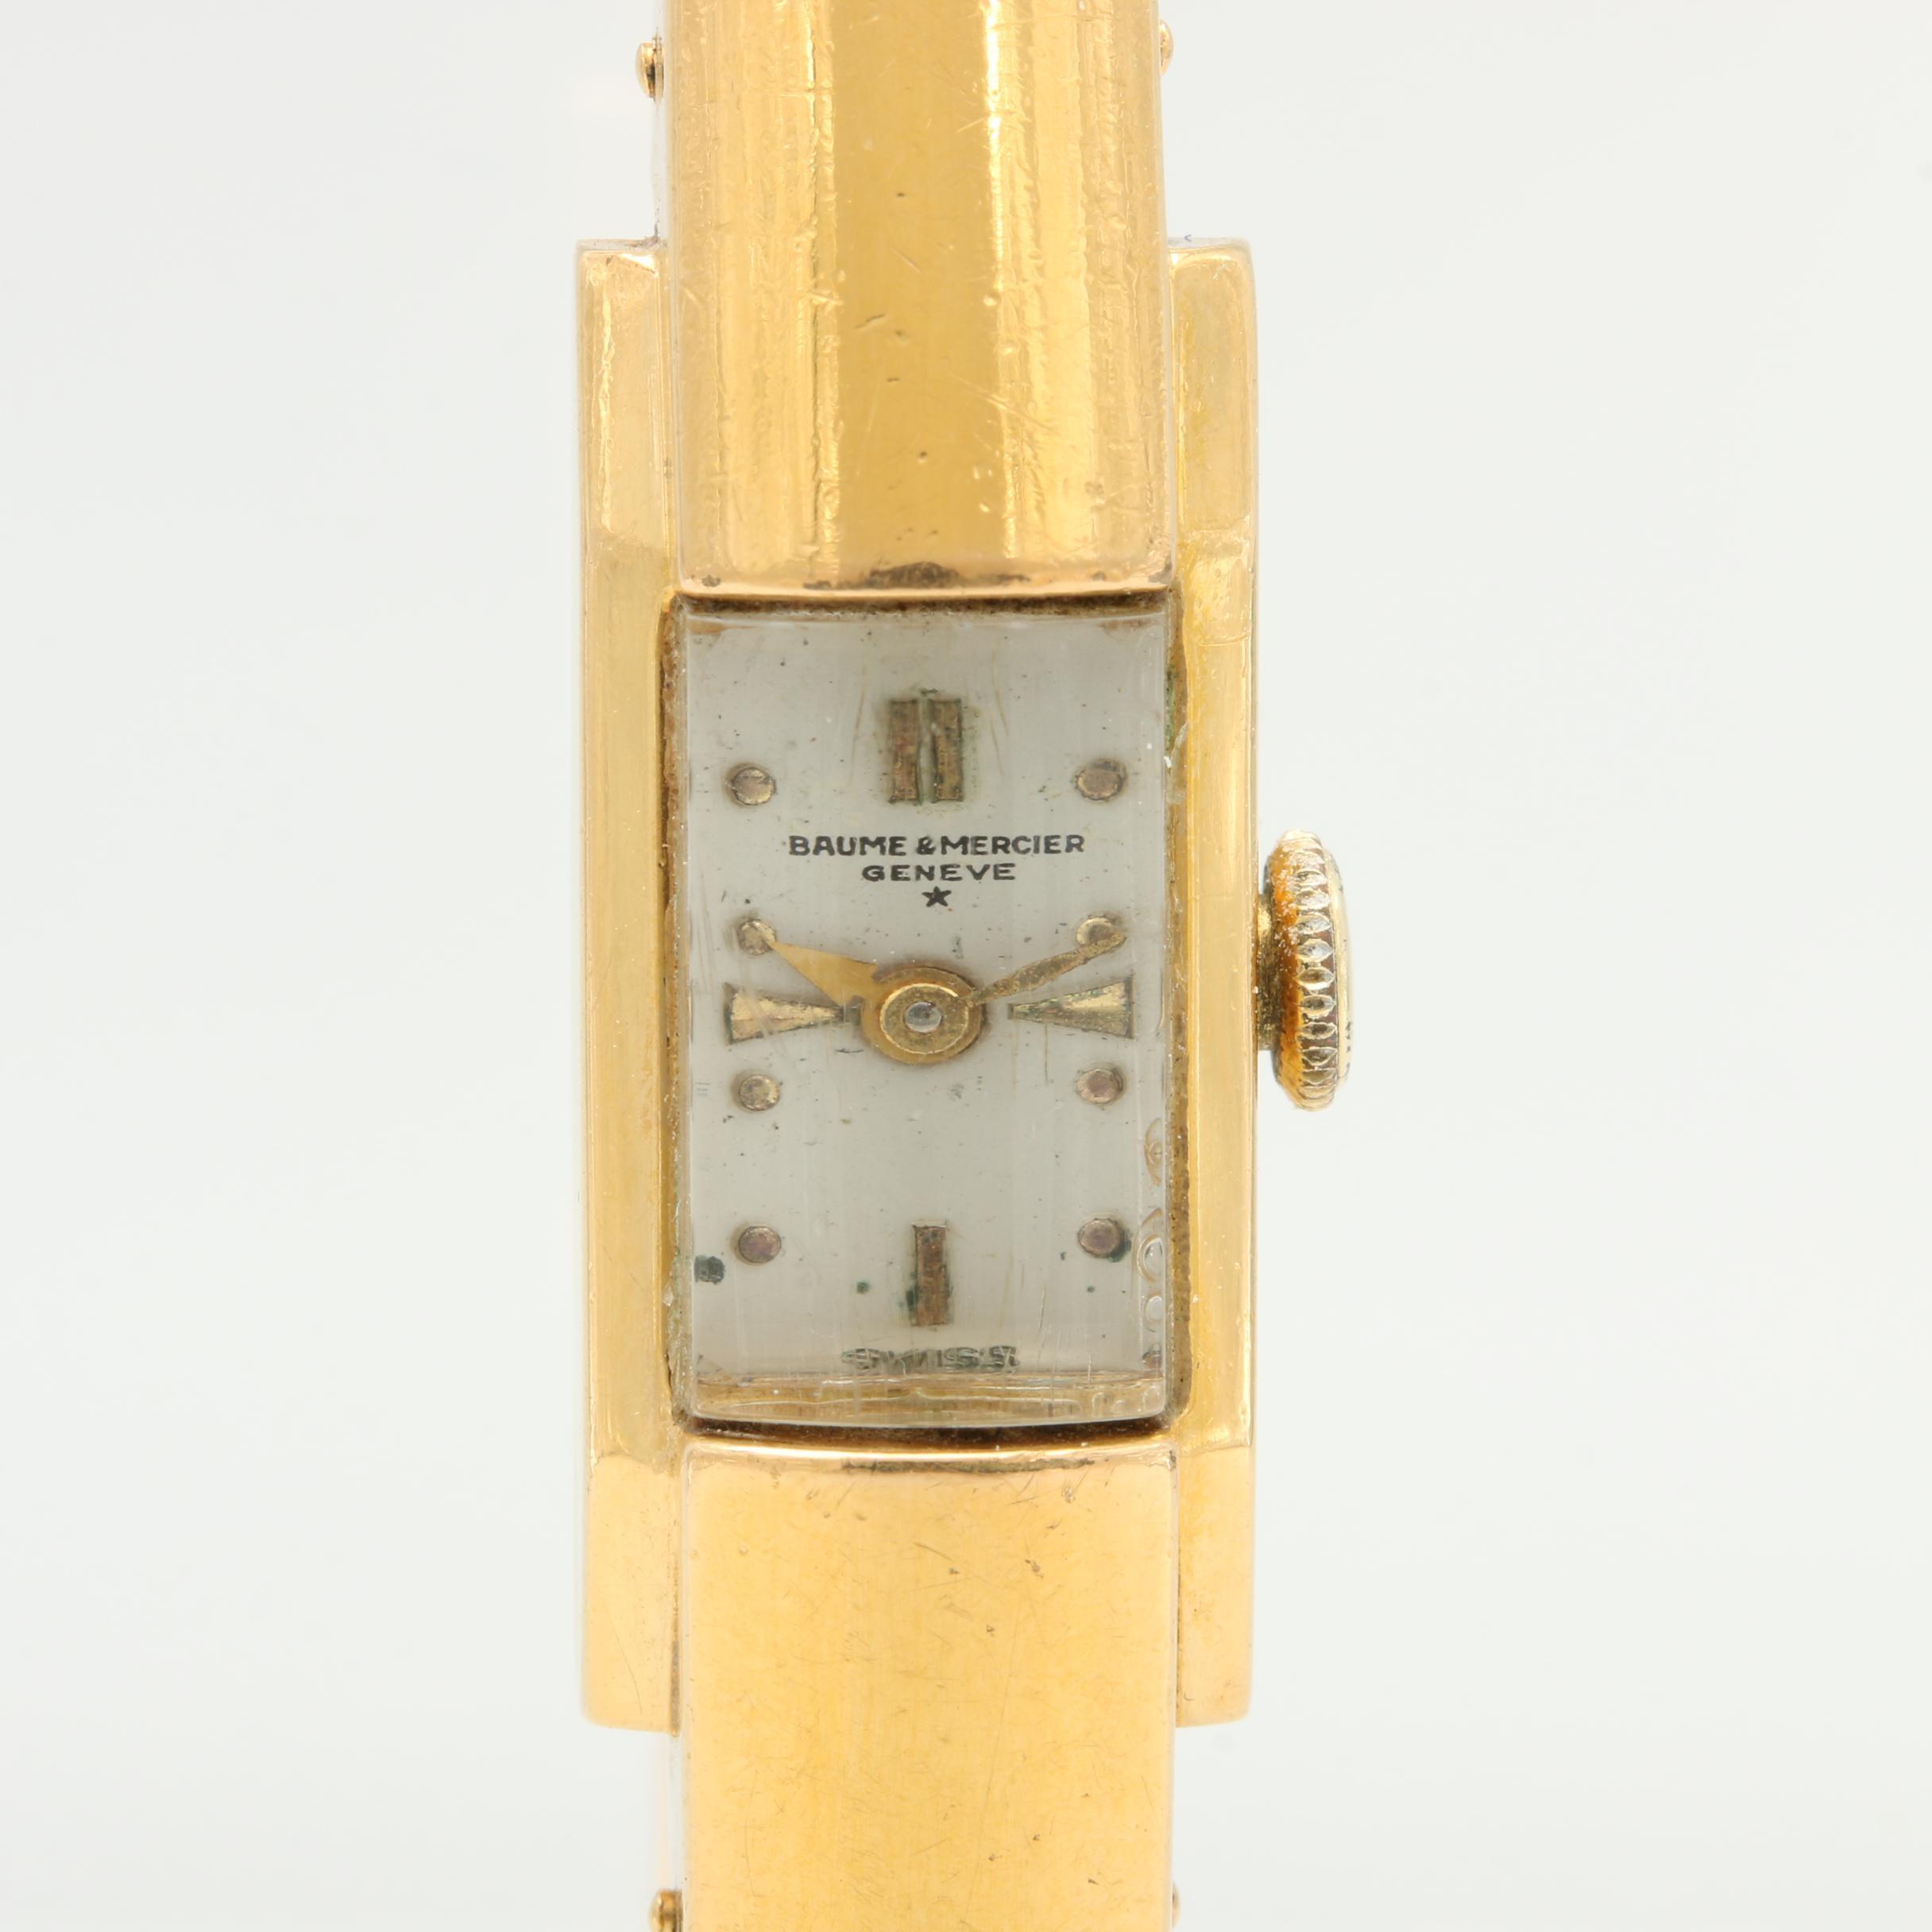 Baume & Mercier Geneve Spring Bangle Bracelet Stainless Steel Wristwatch